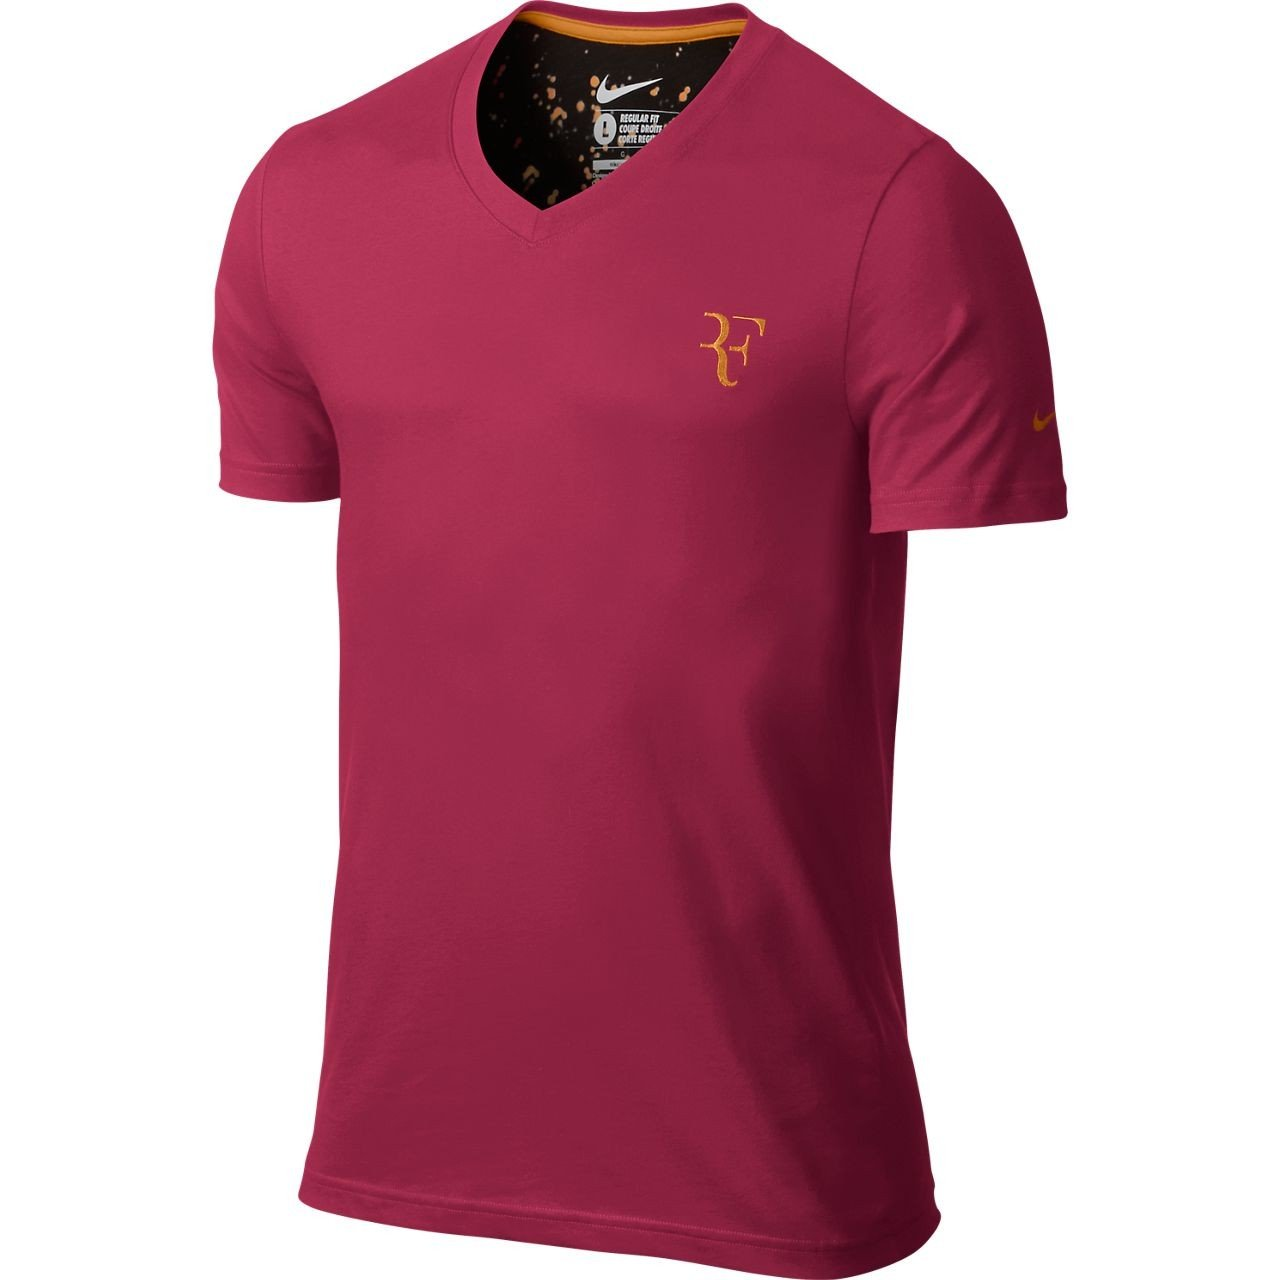 Nike T-Shirt Roger Federer Organic Cotton Men - Camiseta, Color ...